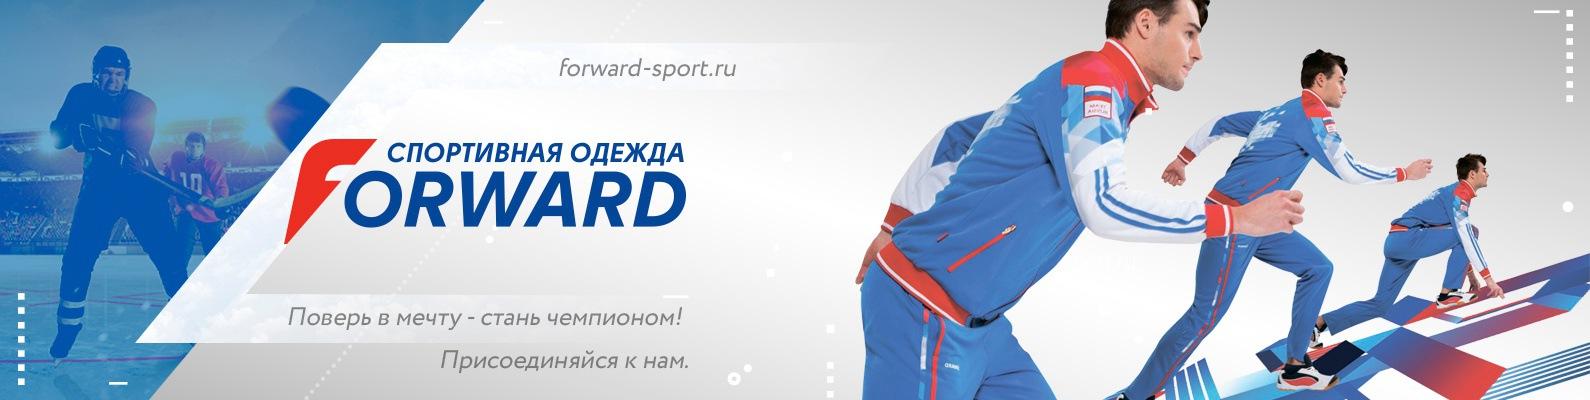 FORWARD   Спортивная одежда   ВКонтакте 5253c51e87a